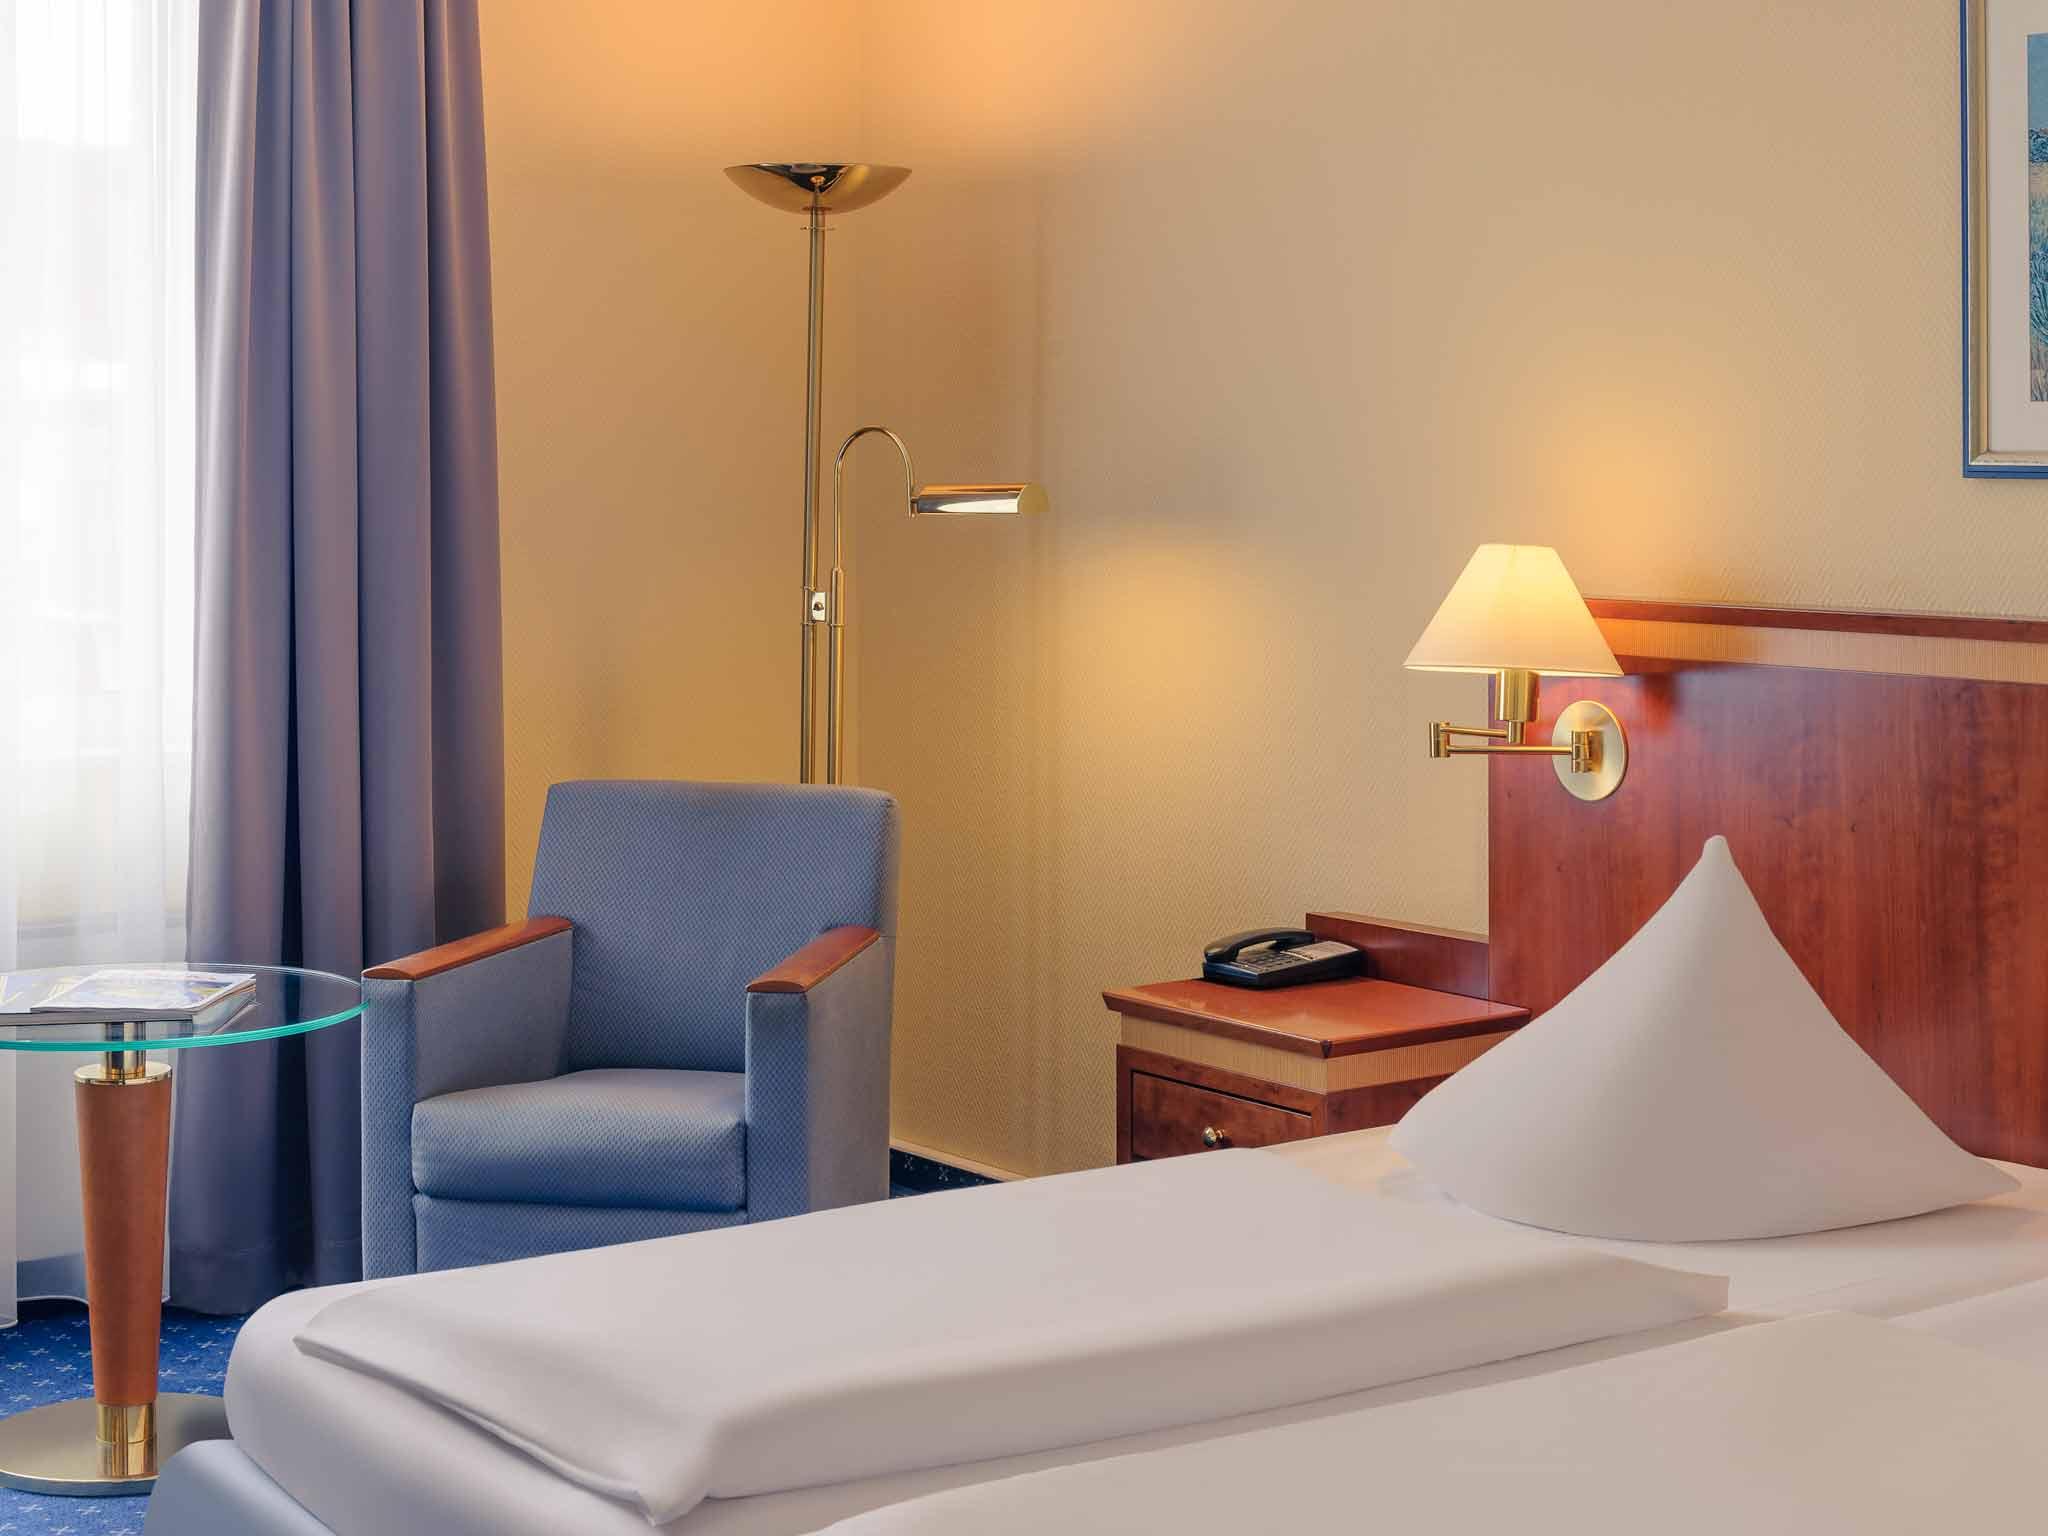 Mercure Hotel Trier Porta Nigra 客房视图